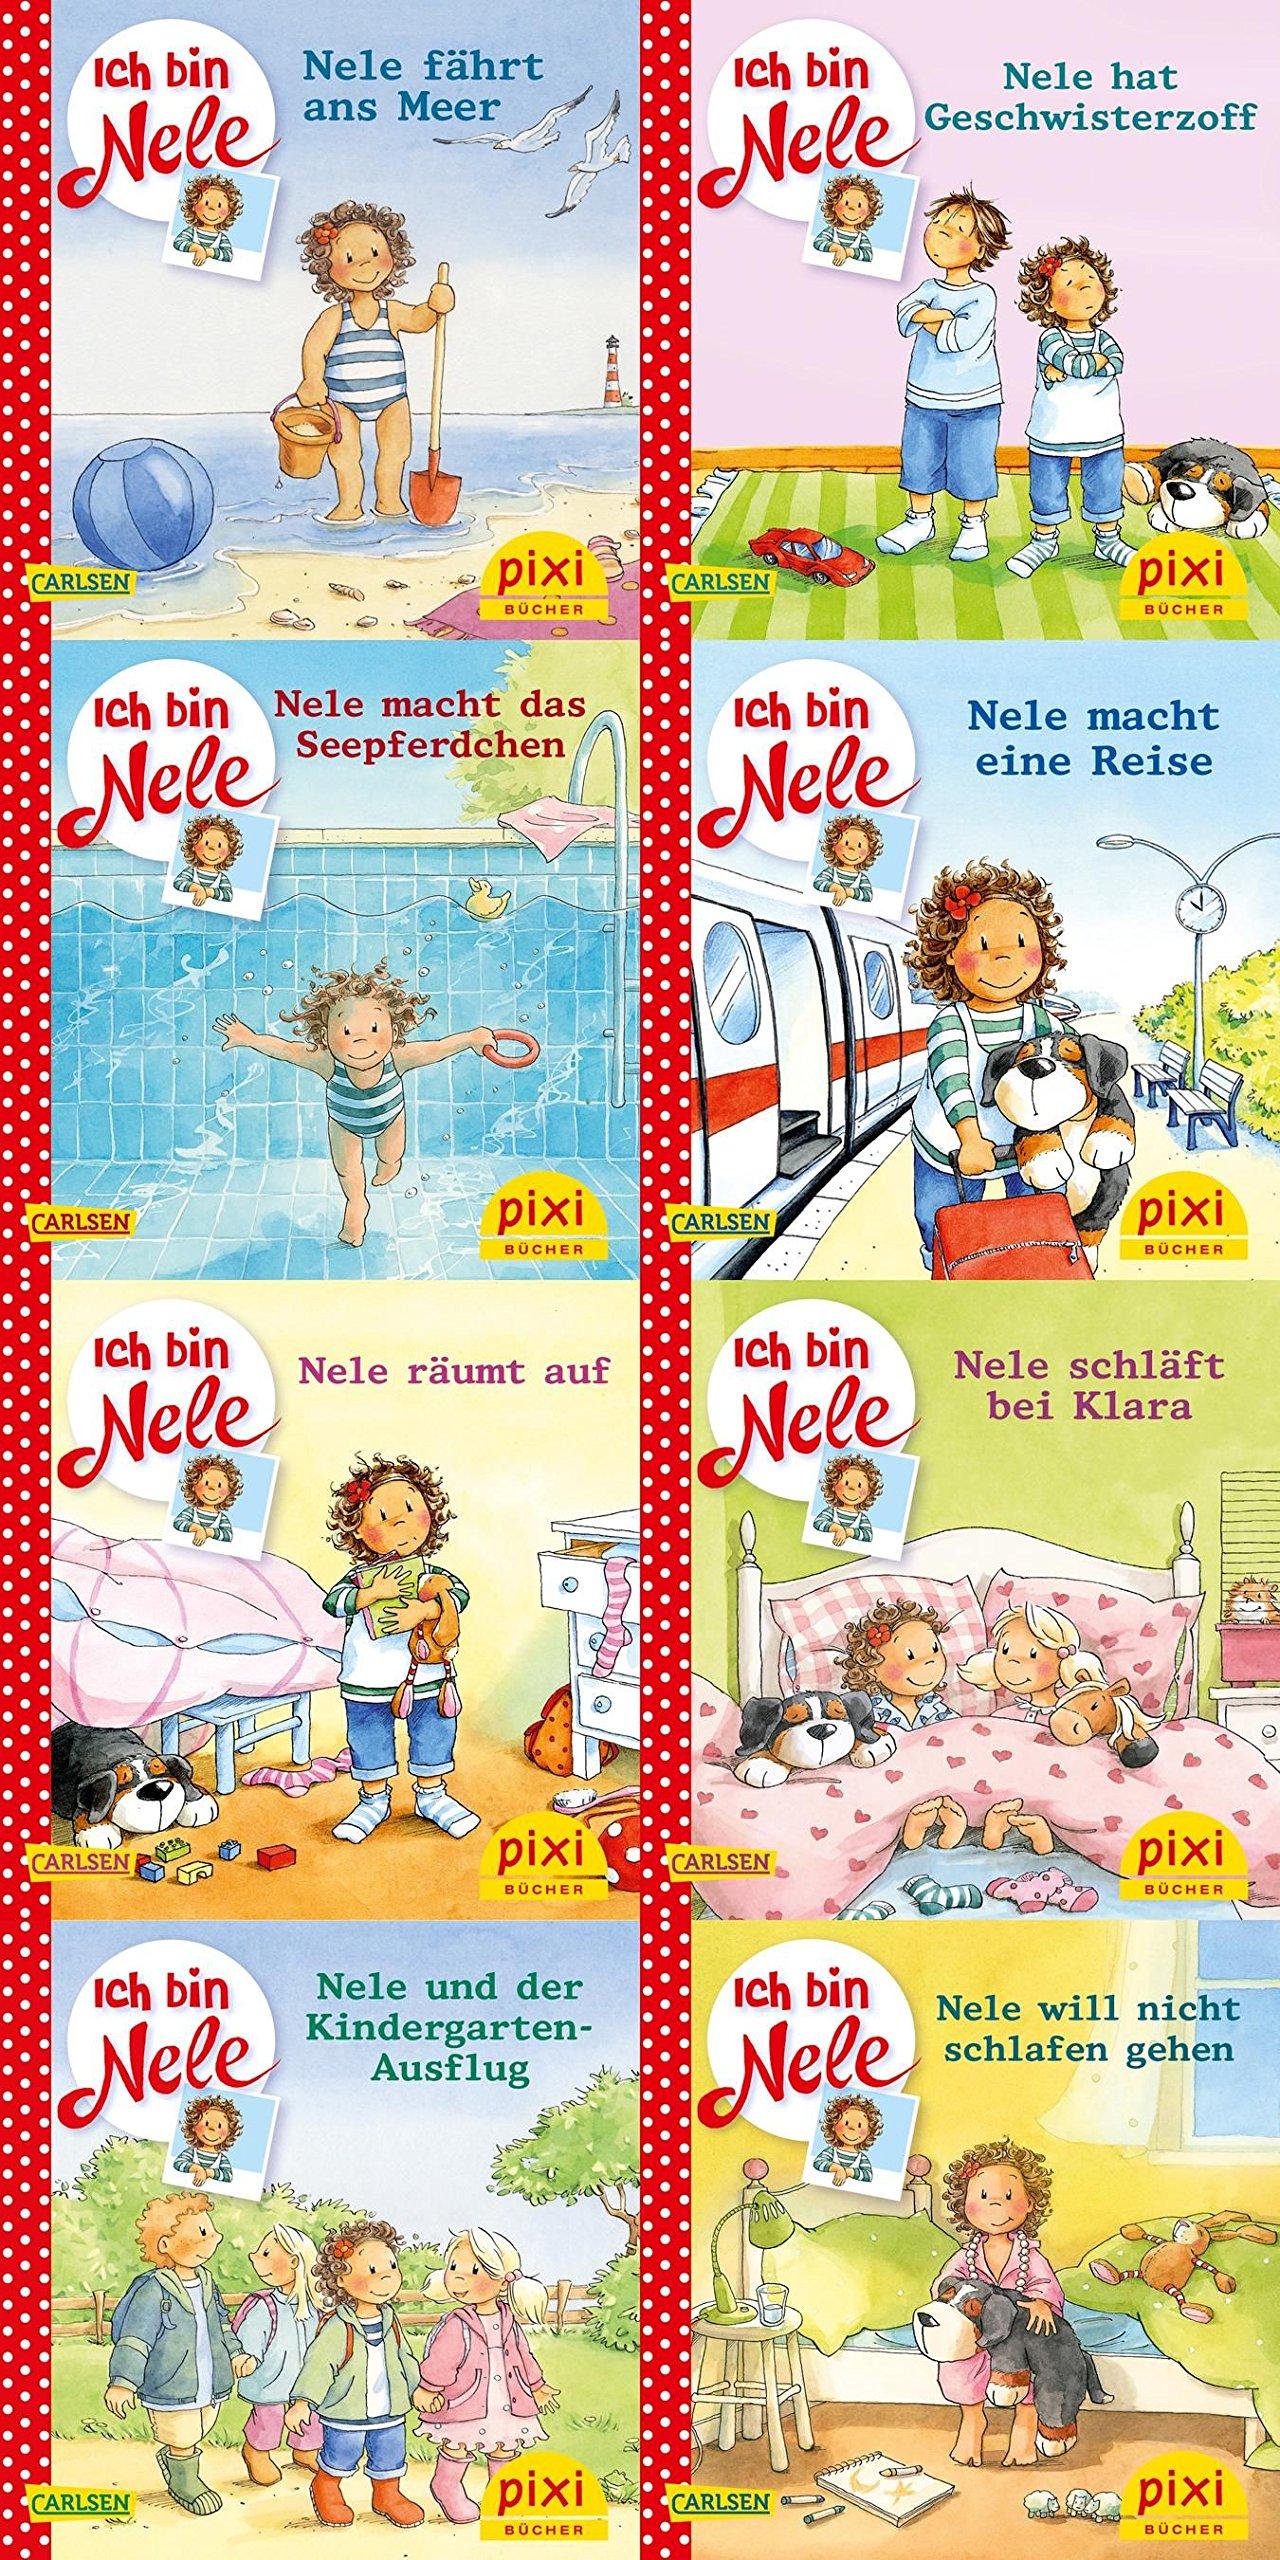 Pixi-8er-Set 248: Ich bin Nele (8x1 Exemplar)